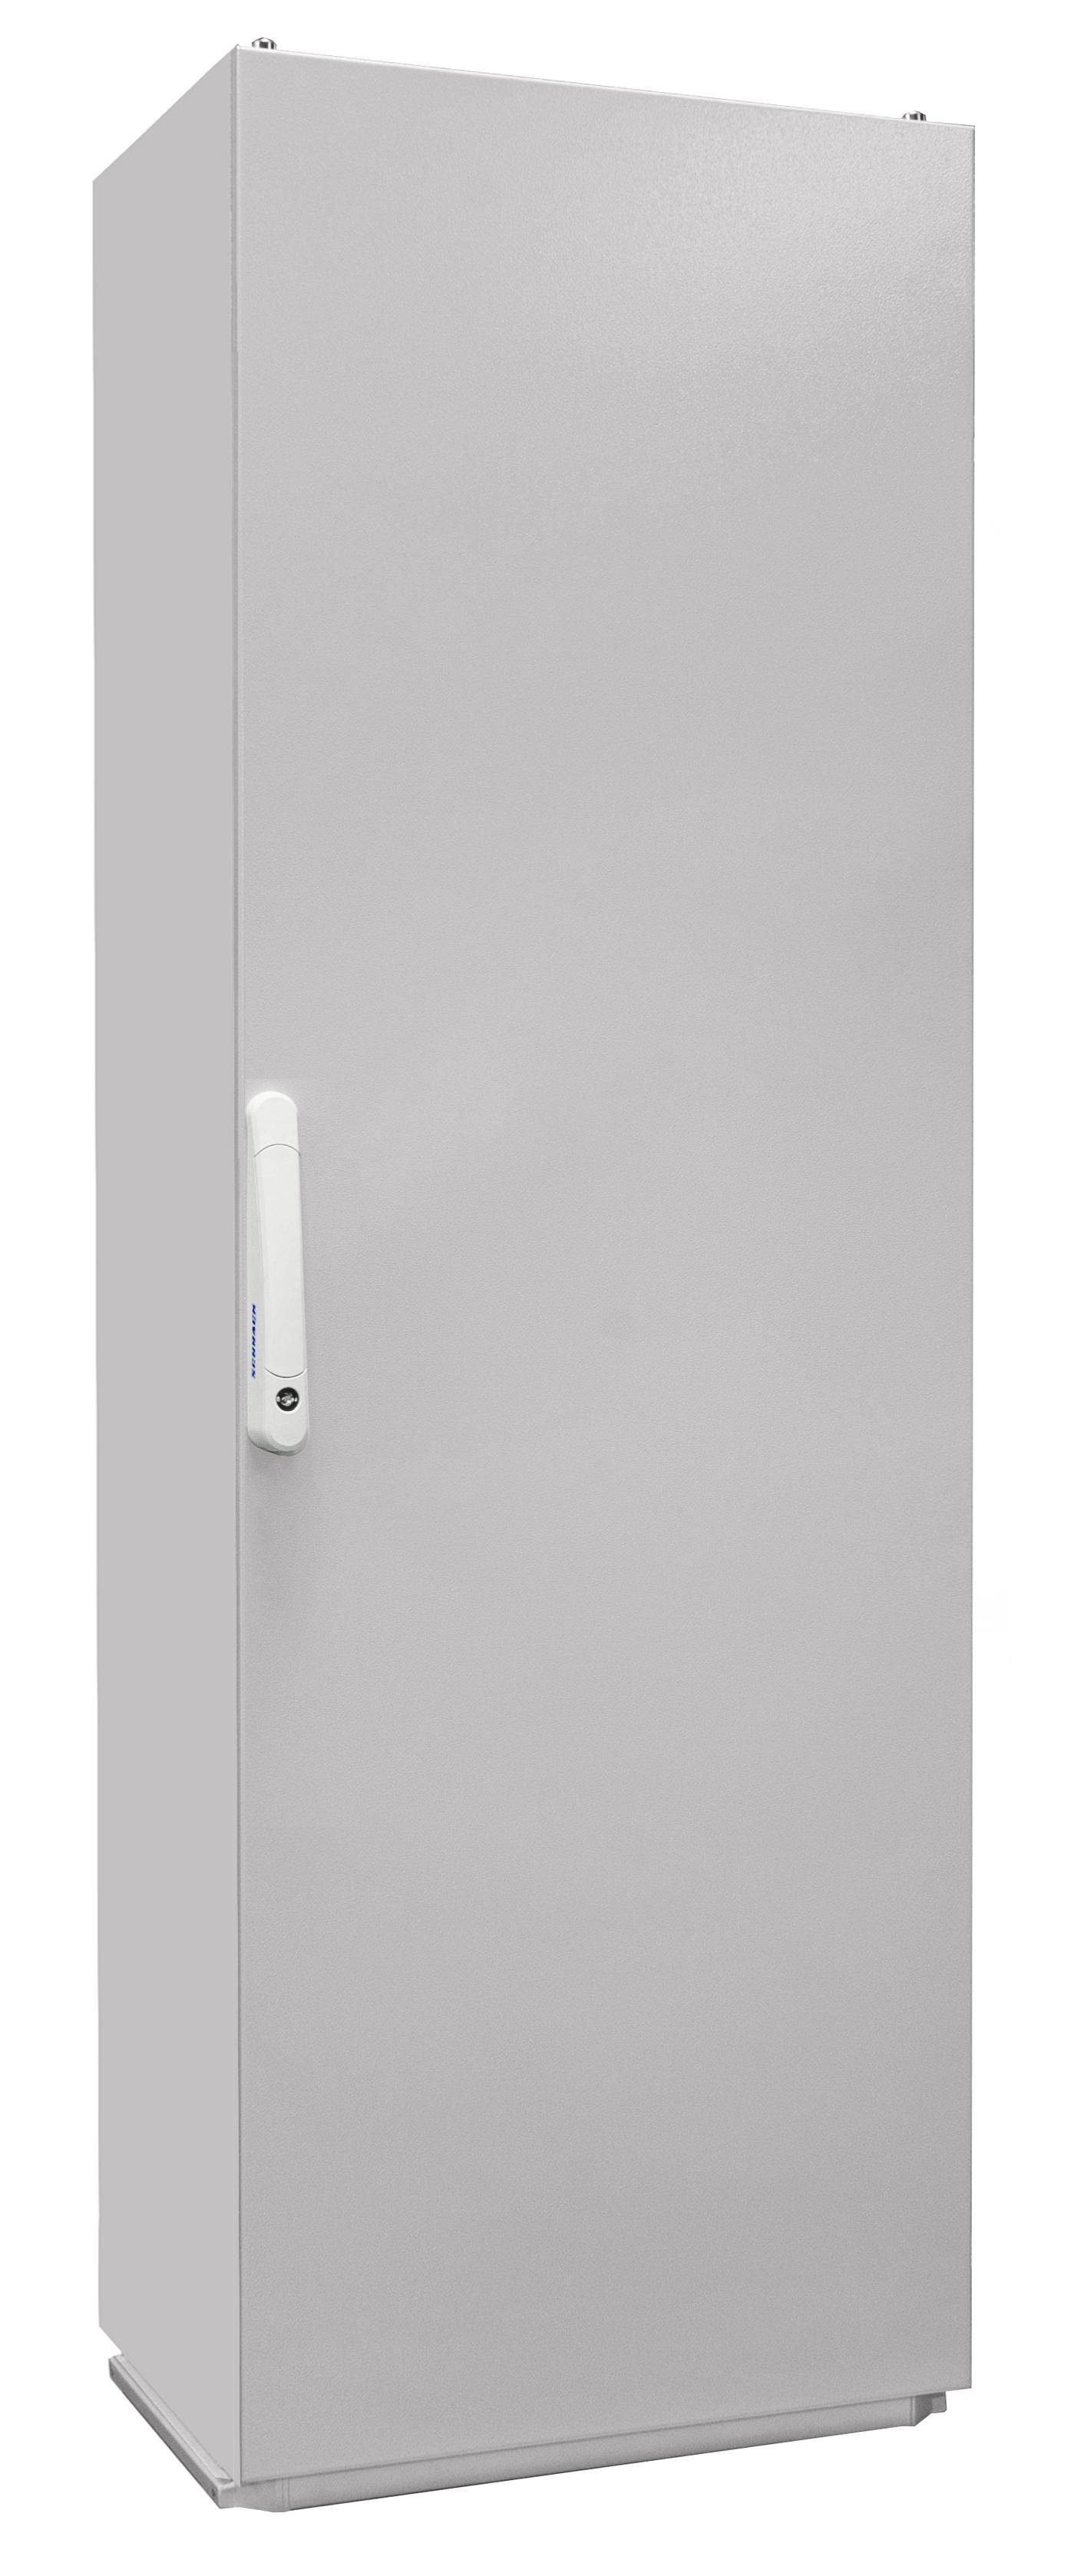 1 Stk Kompaktschrank 1-Tür IP55 H=1800 B=600 T=400mm Stahlblech KC186040--